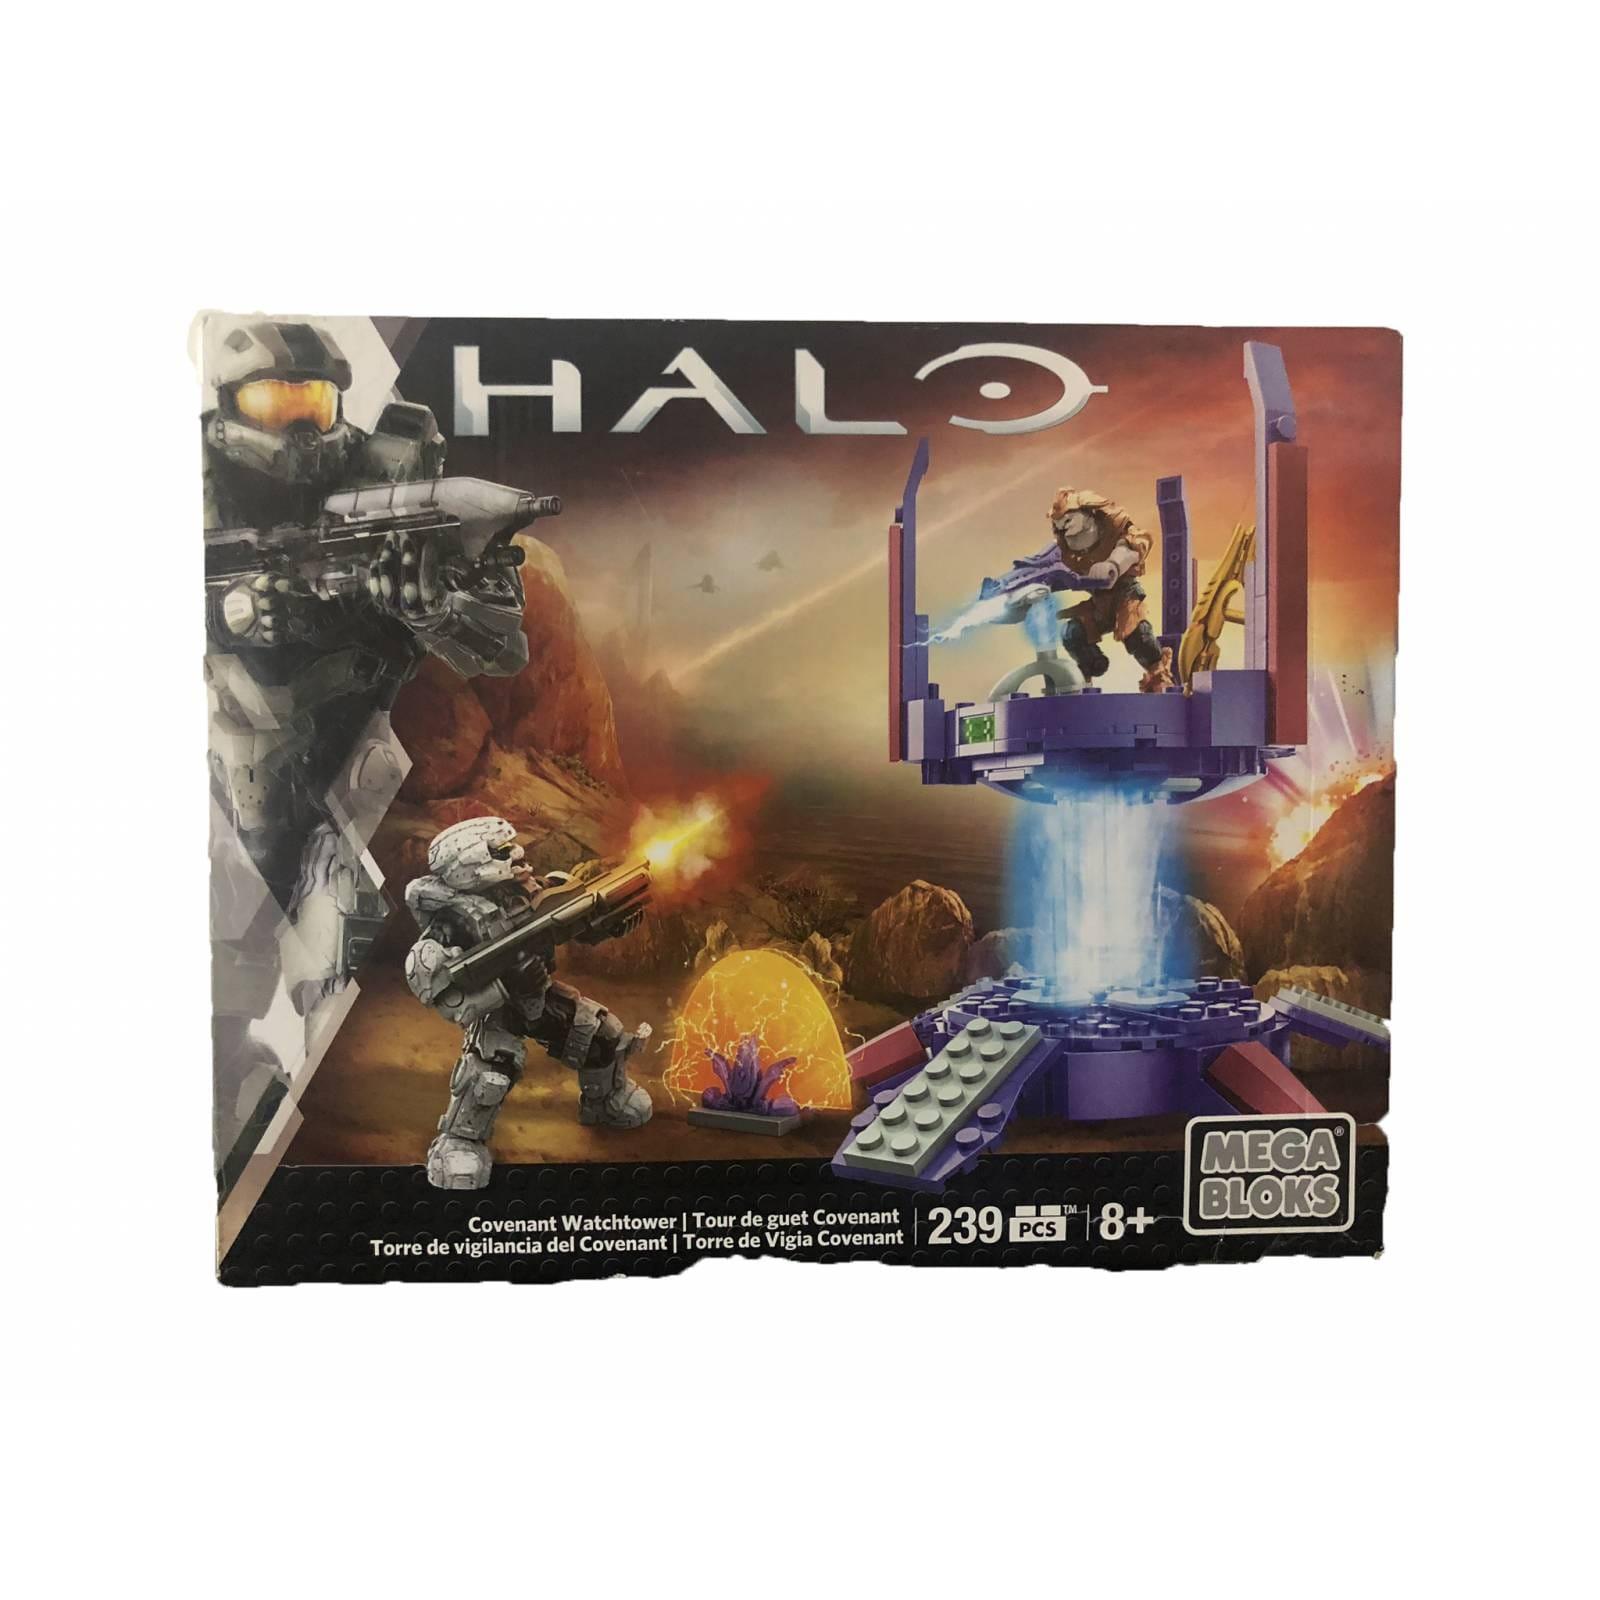 Megabloks, Halo - Torre de vigilancia del covenant. 239 piezas.